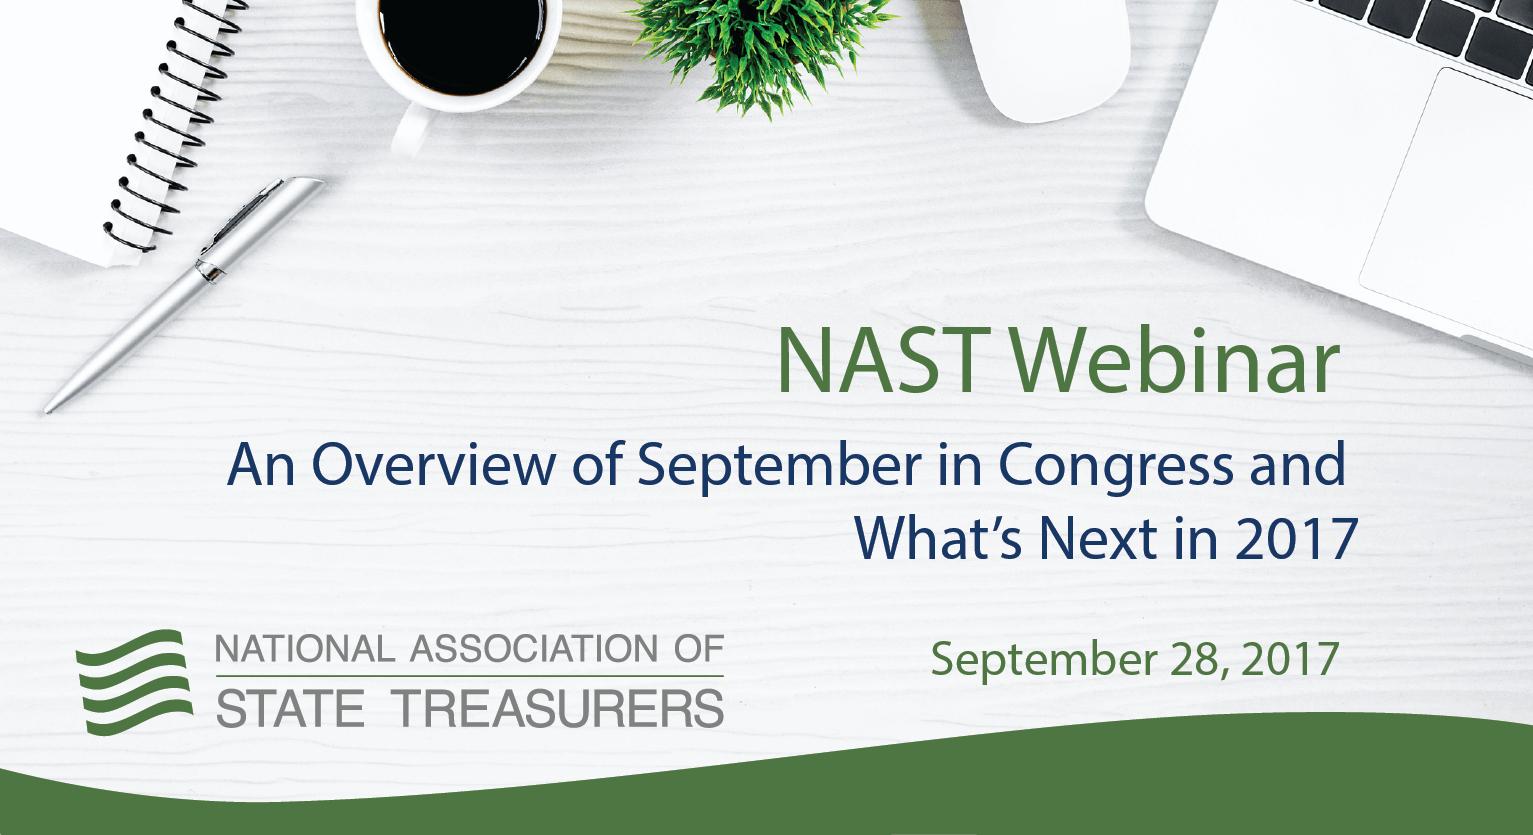 NAST Webinar - Congress Overview